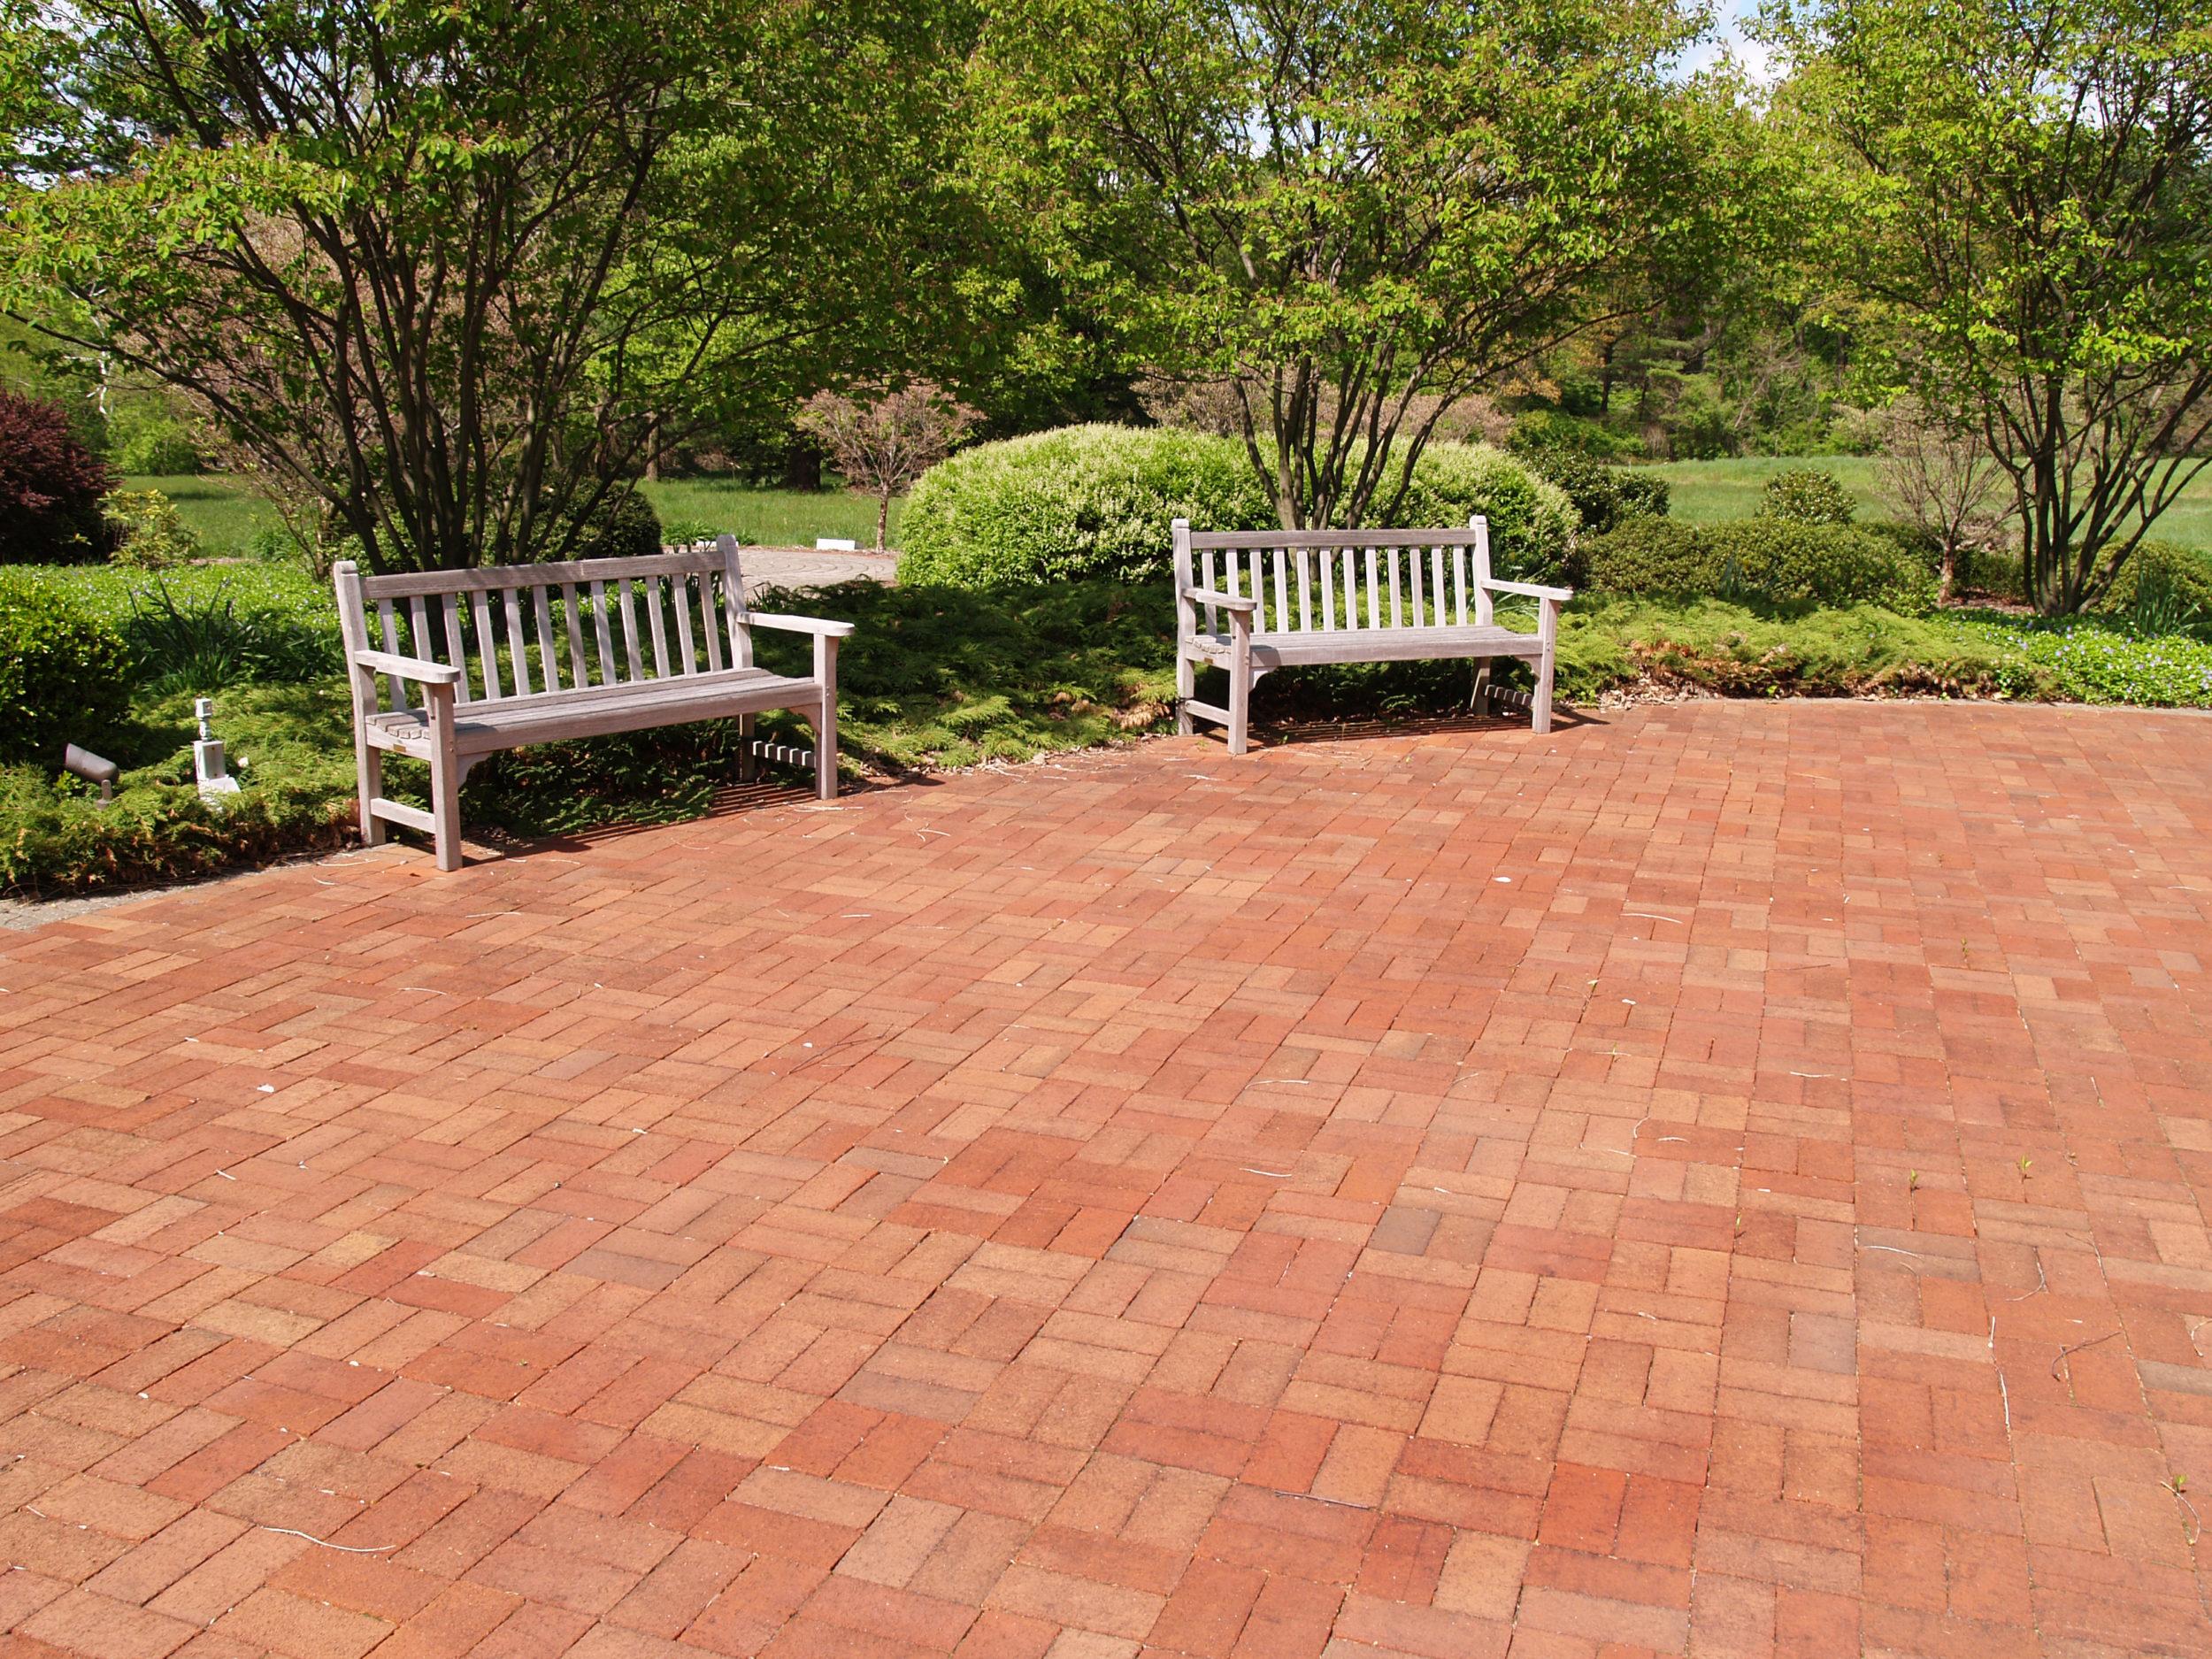 patio made of brick